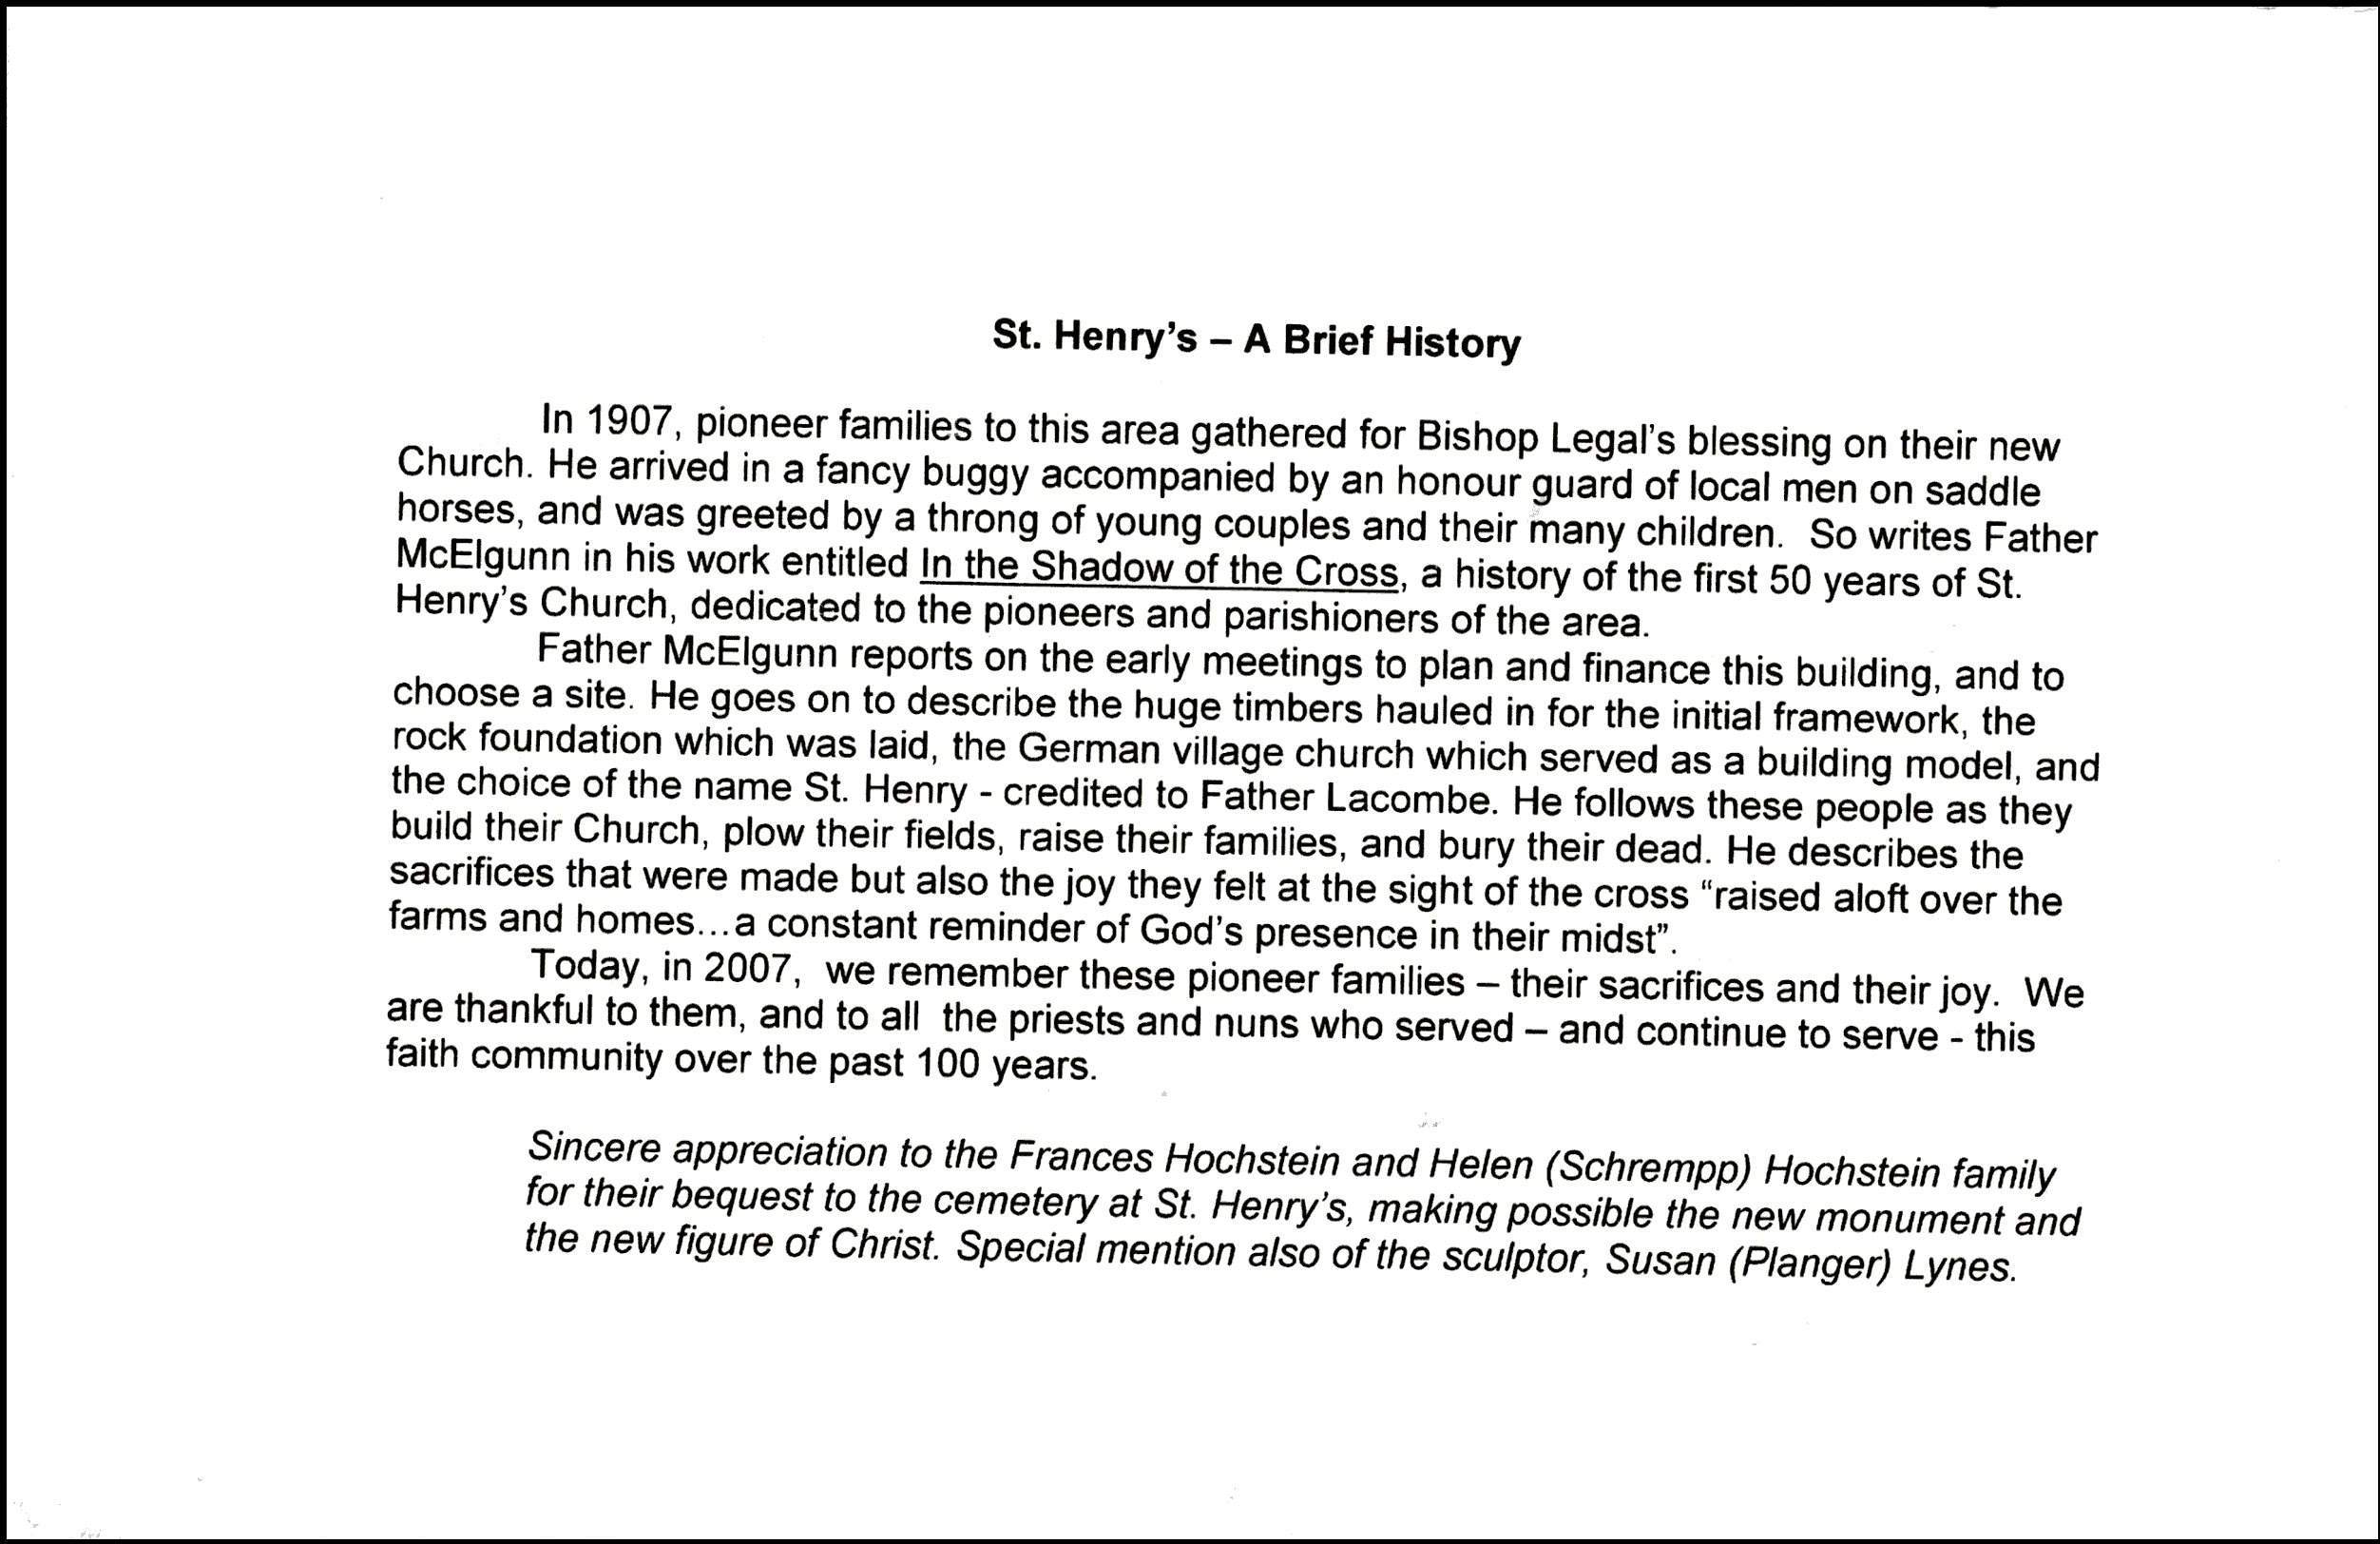 2007 Celebration of Thanksgiving | St Henrys